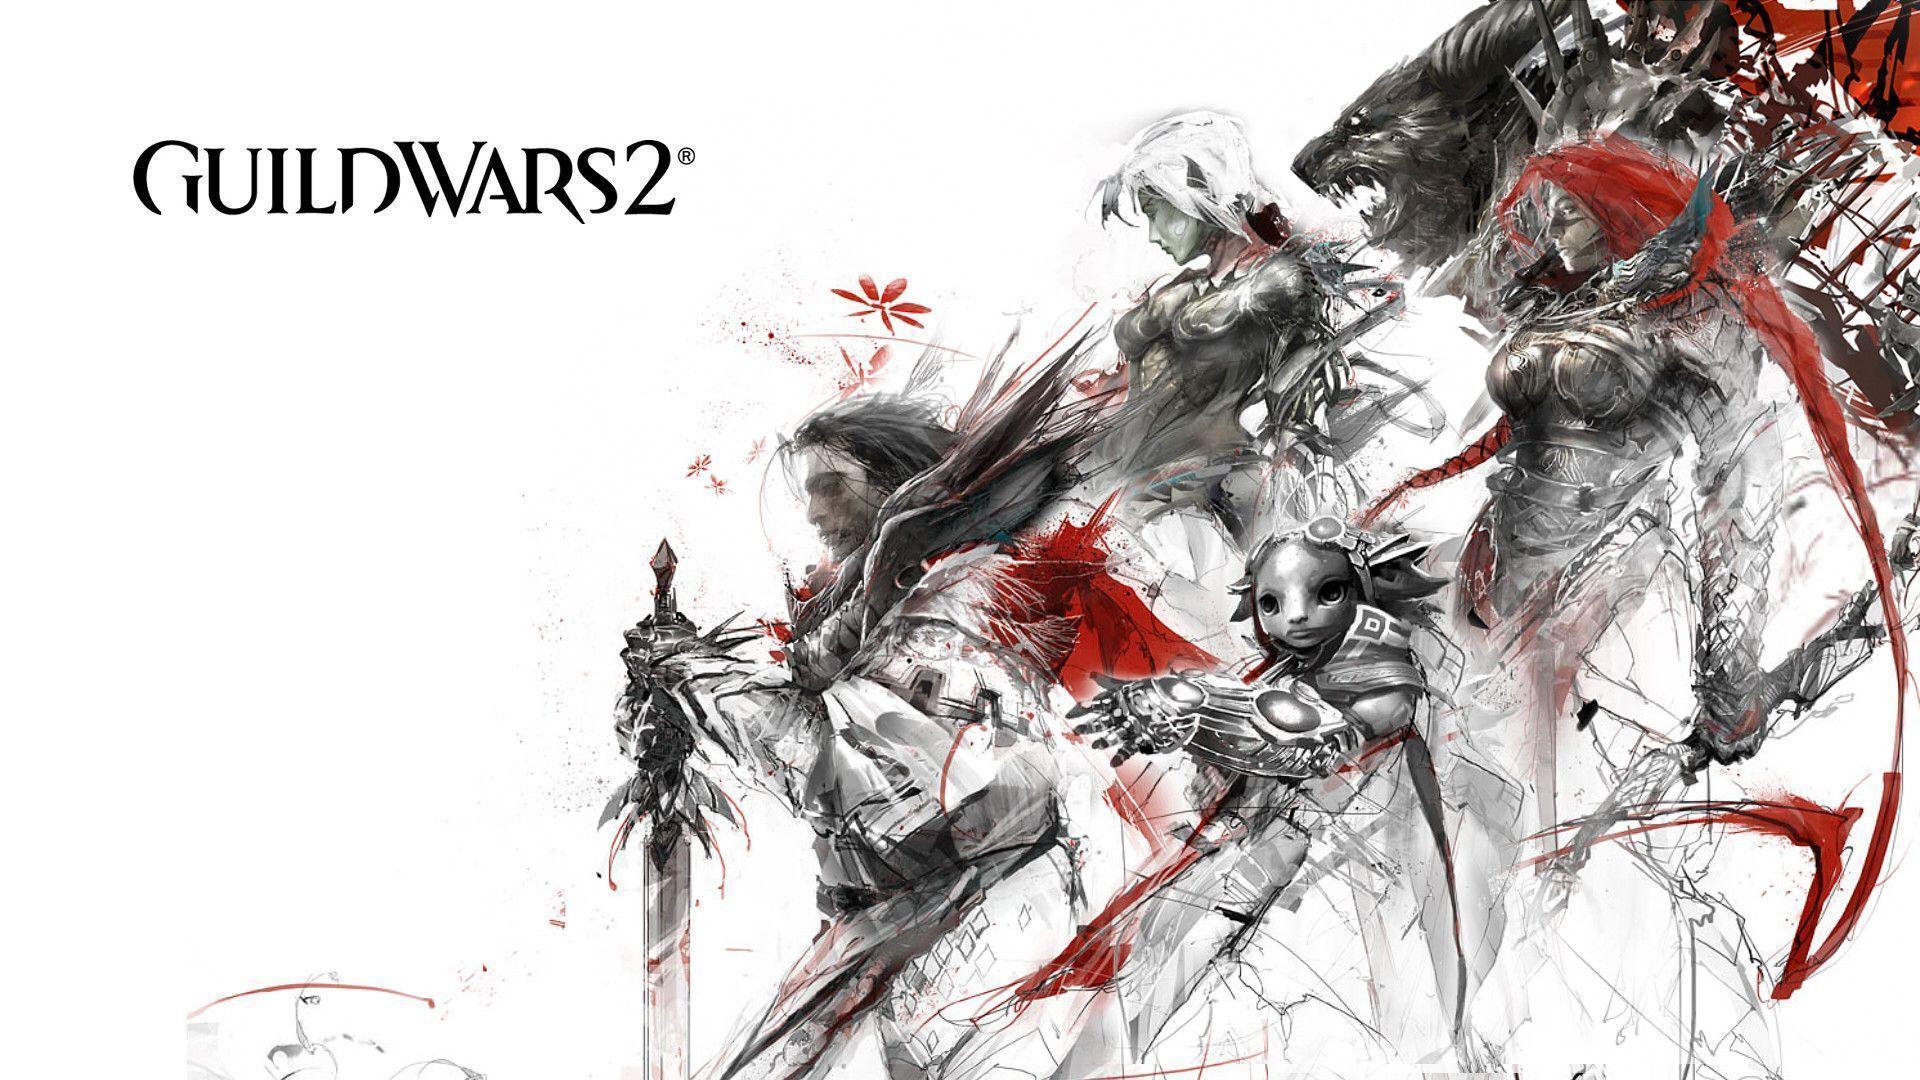 Guild Wars 2 Wallpaper: Guild Wars 2 Guardian Wallpapers